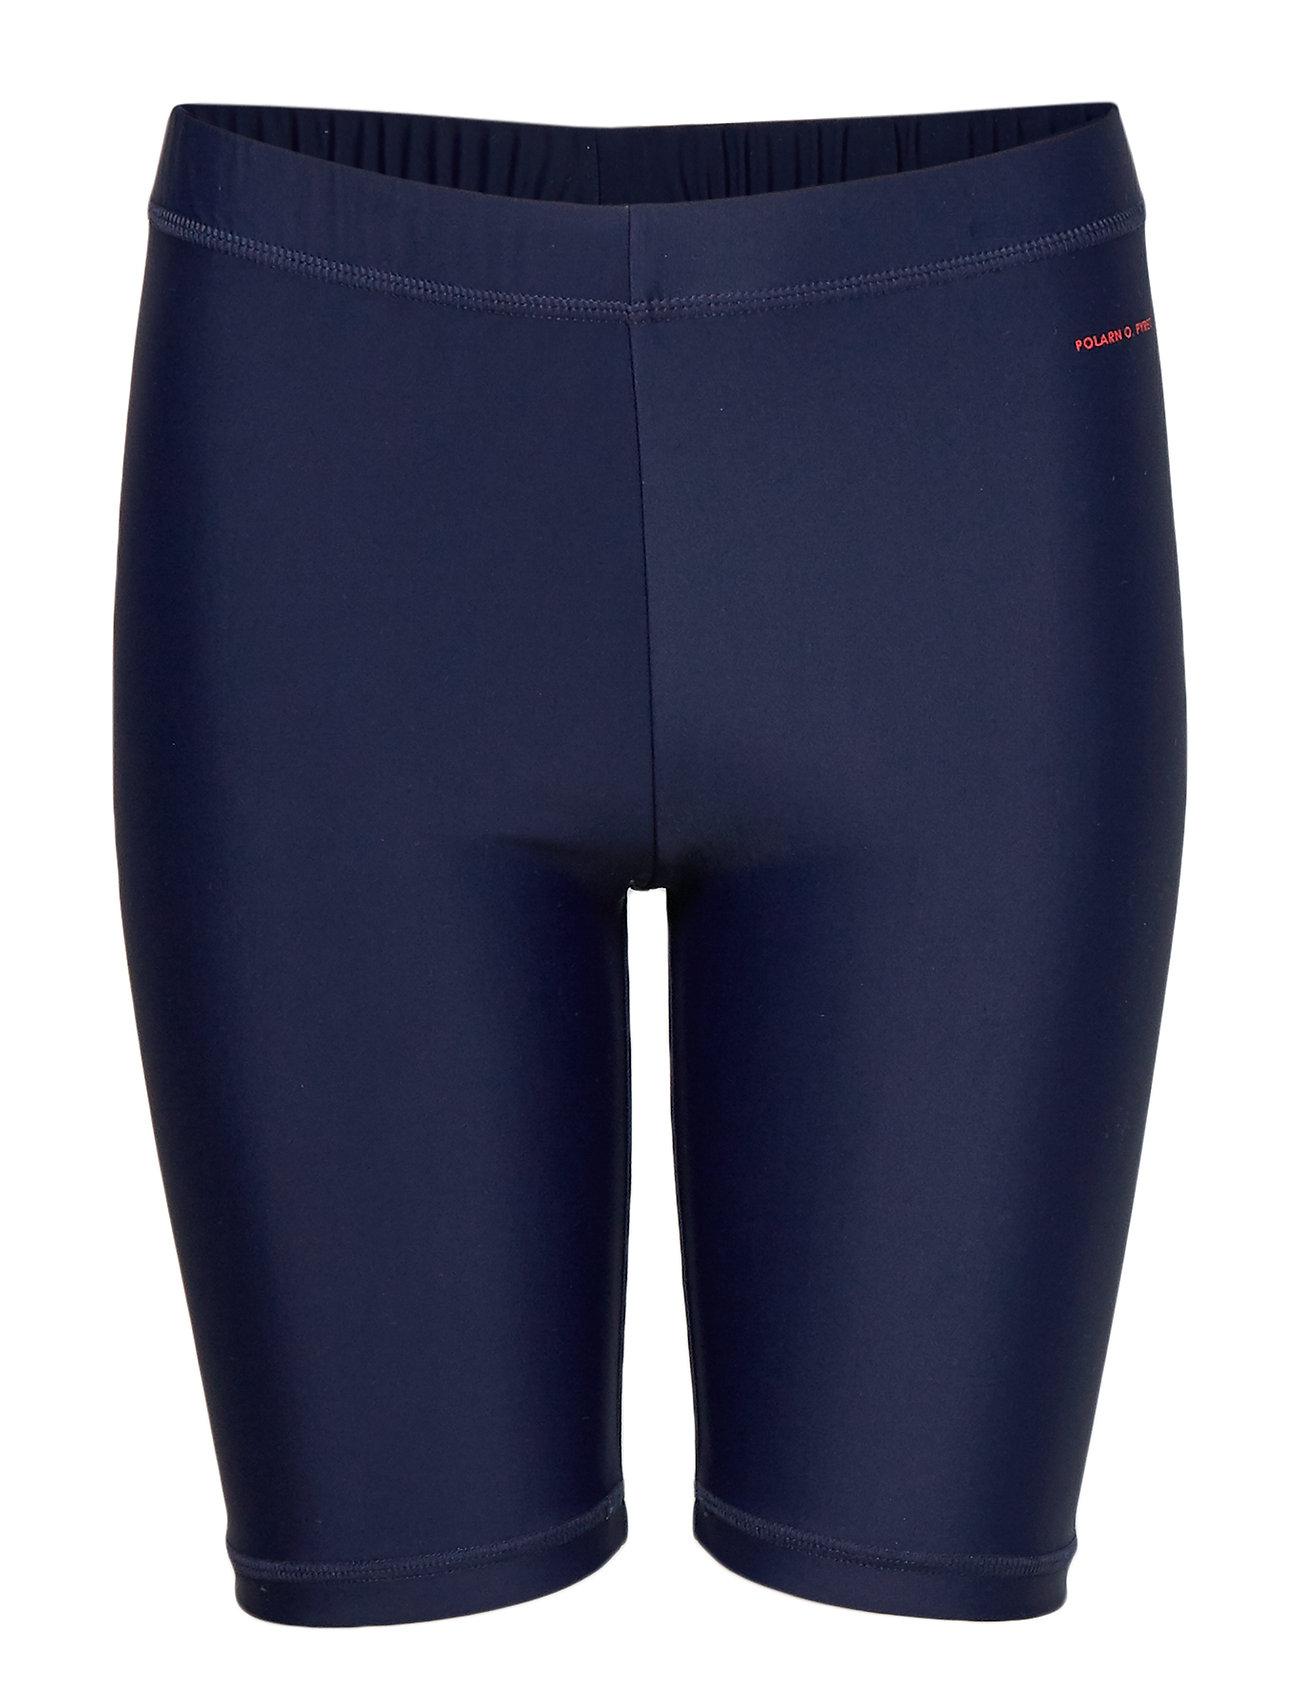 Polarn O. Pyret Swimwear Pants Short UPF - DARK SAPPHIRE